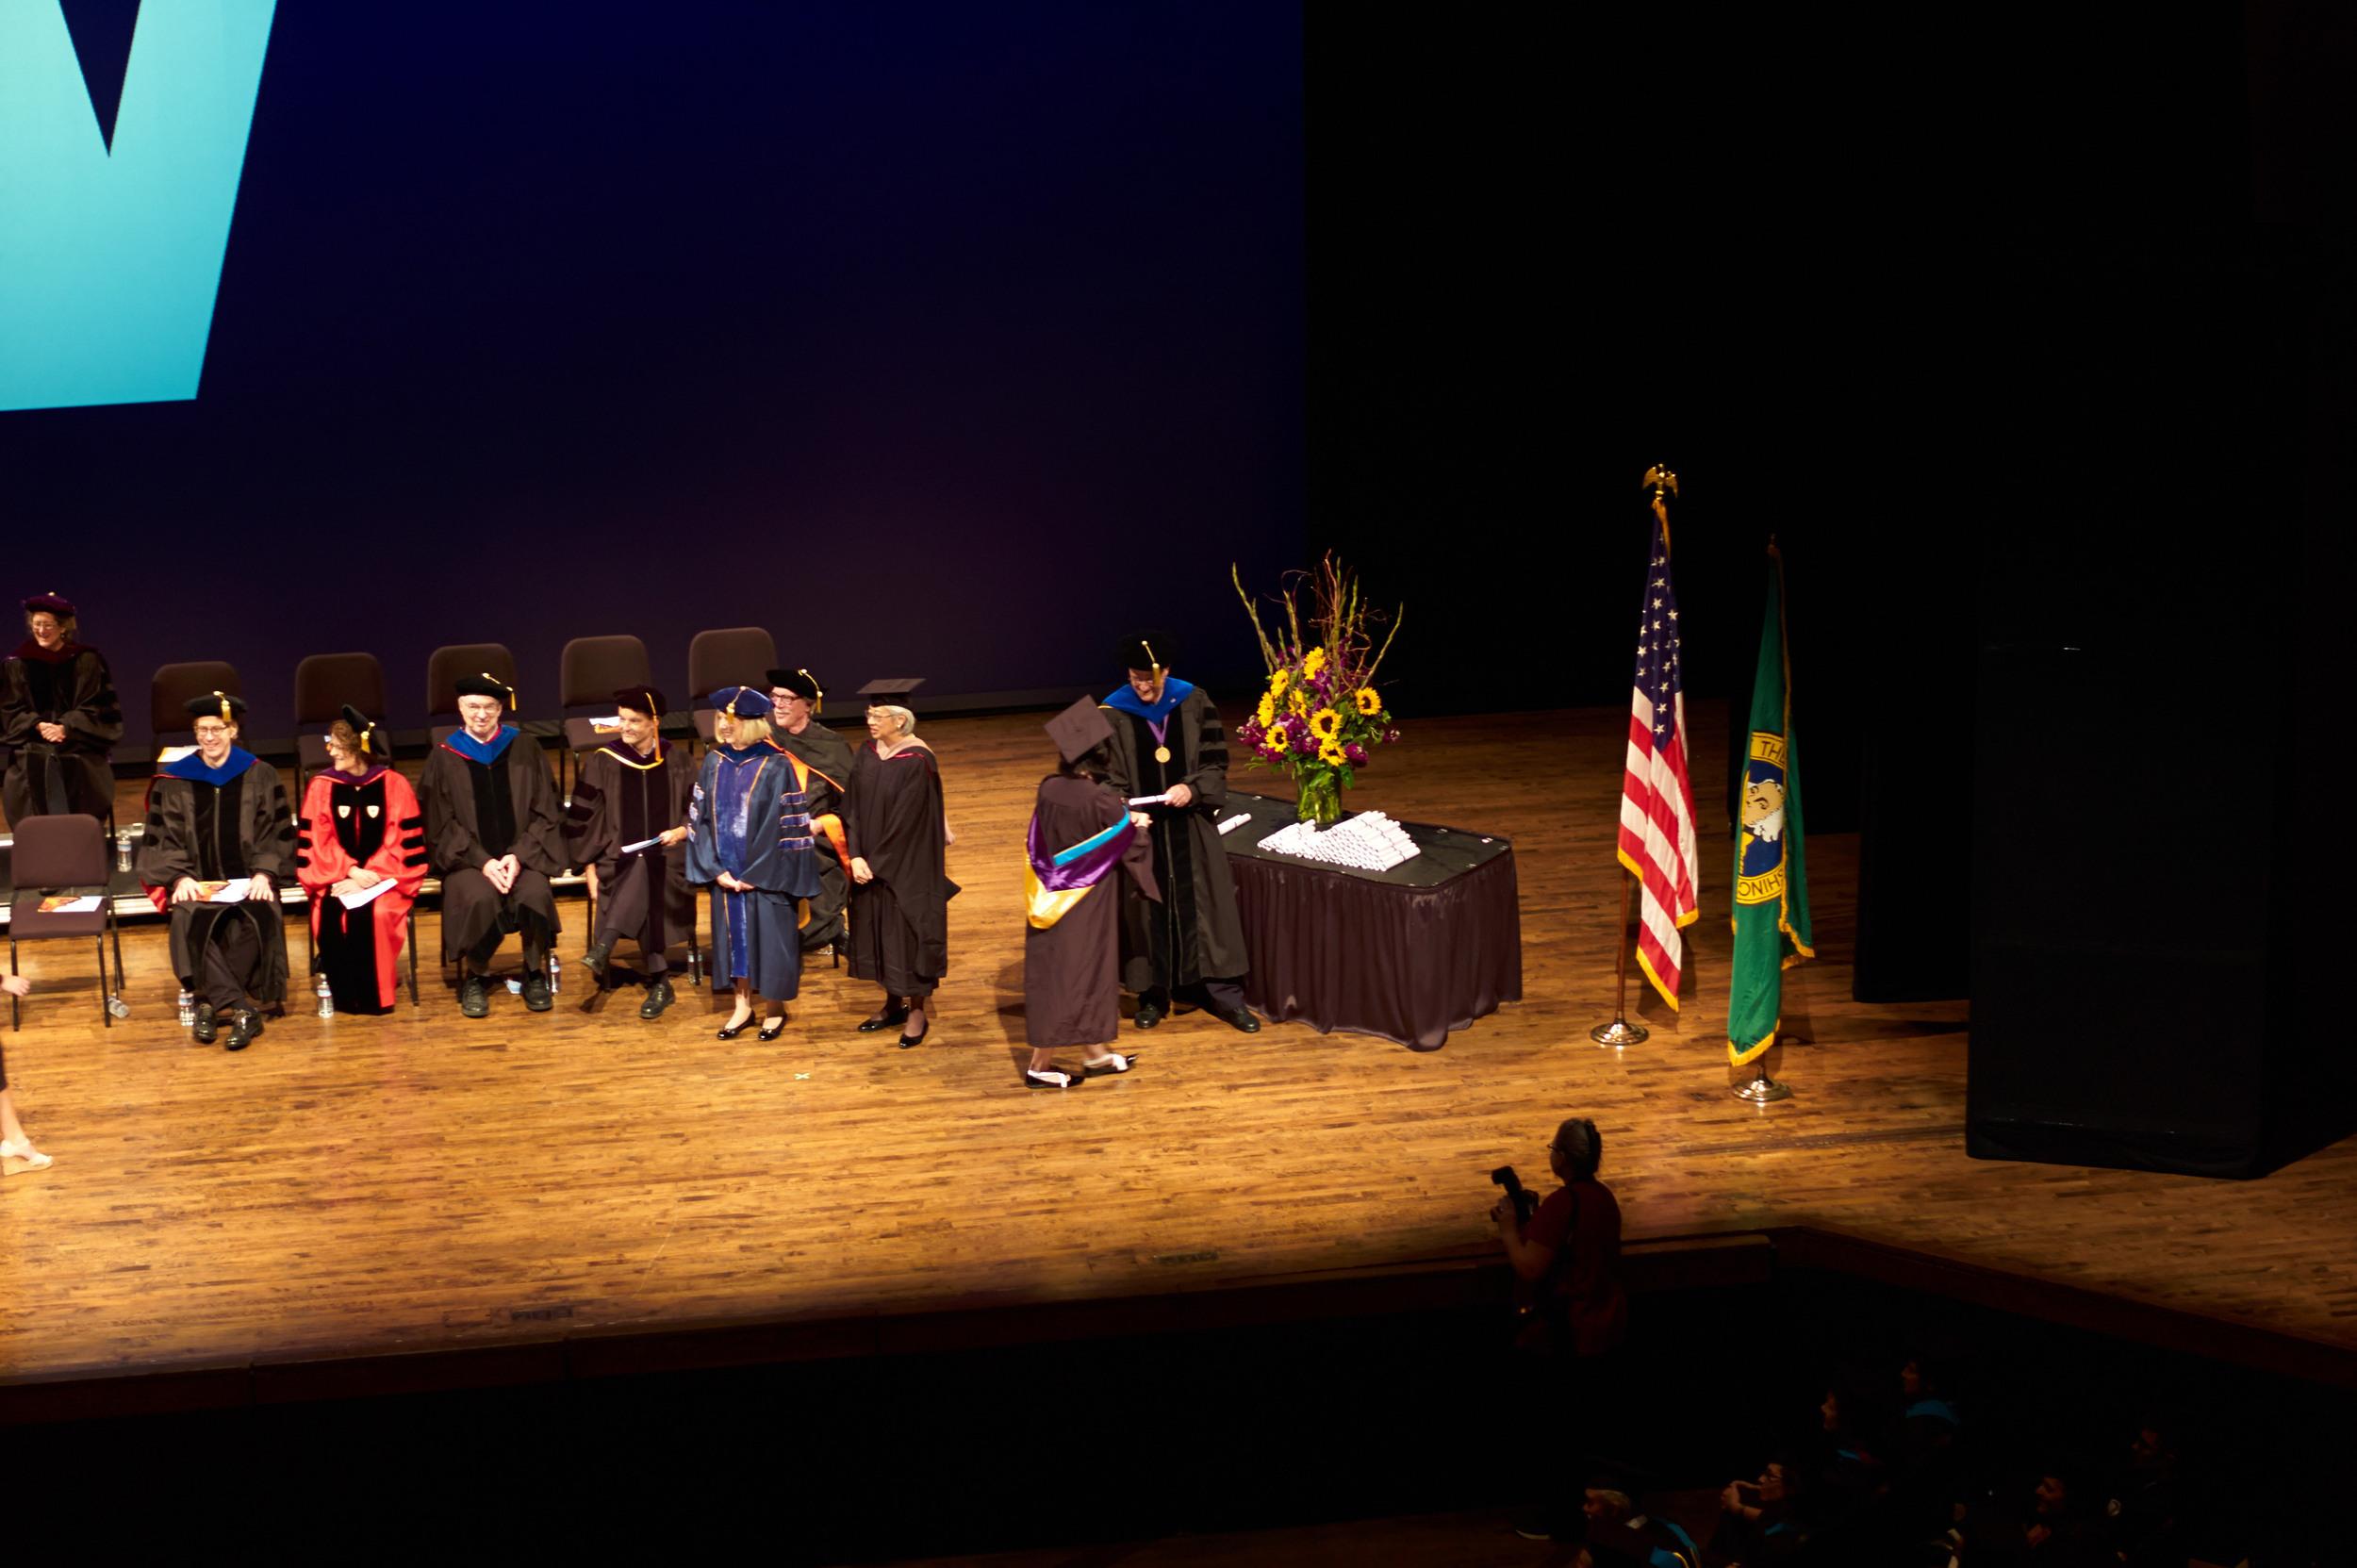 20140612_m9_EvansSchool_Graduation_007_Color.jpg